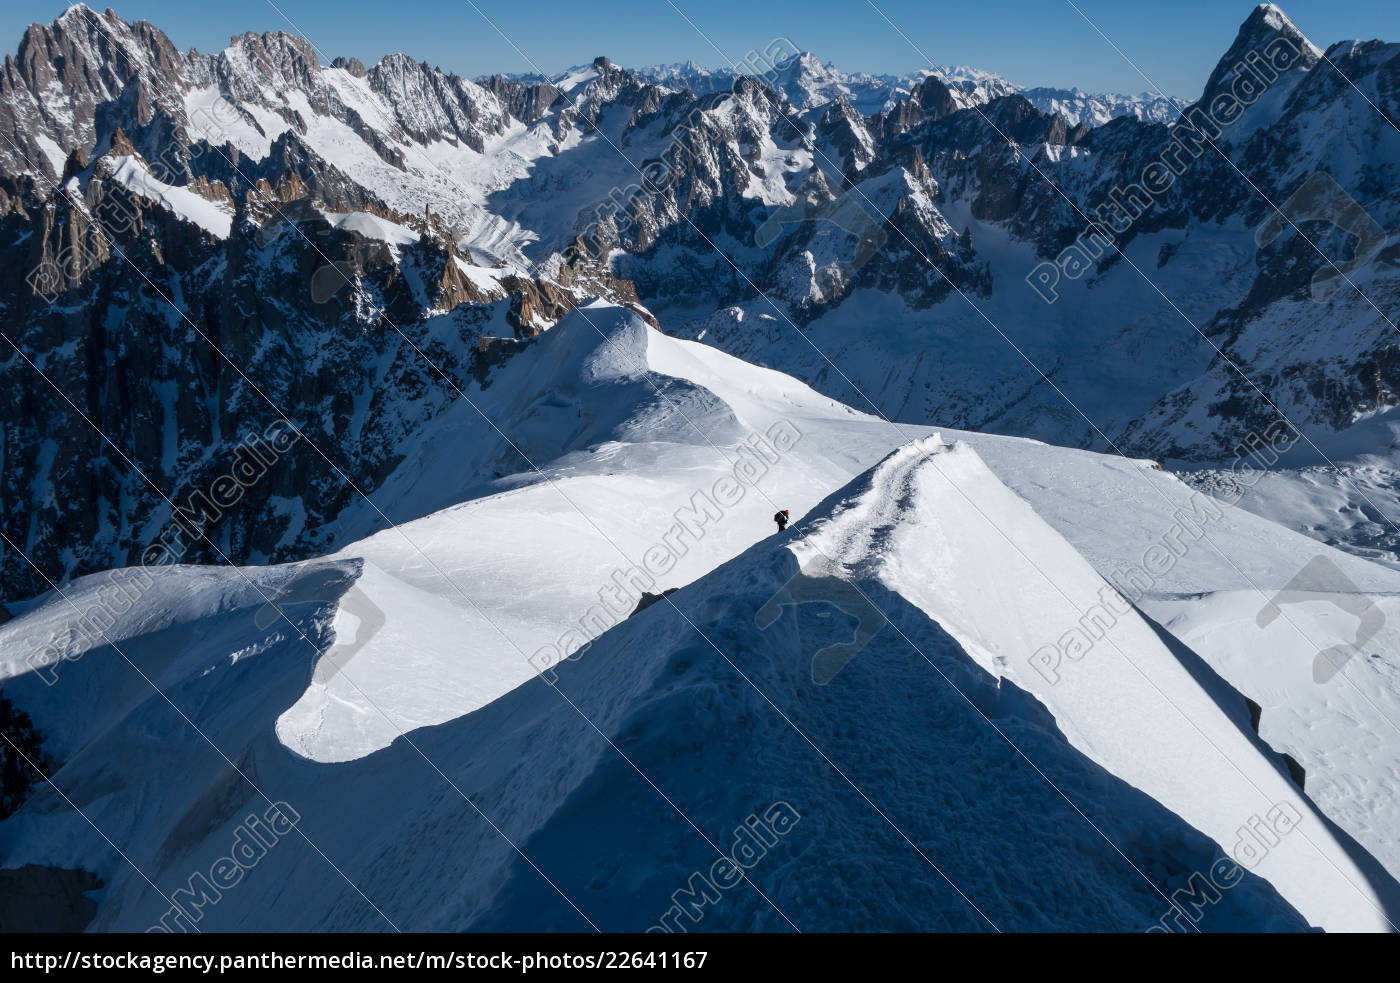 Klettersteig Chamonix : Klettersteig chamonix tag in moosbrugger climbing